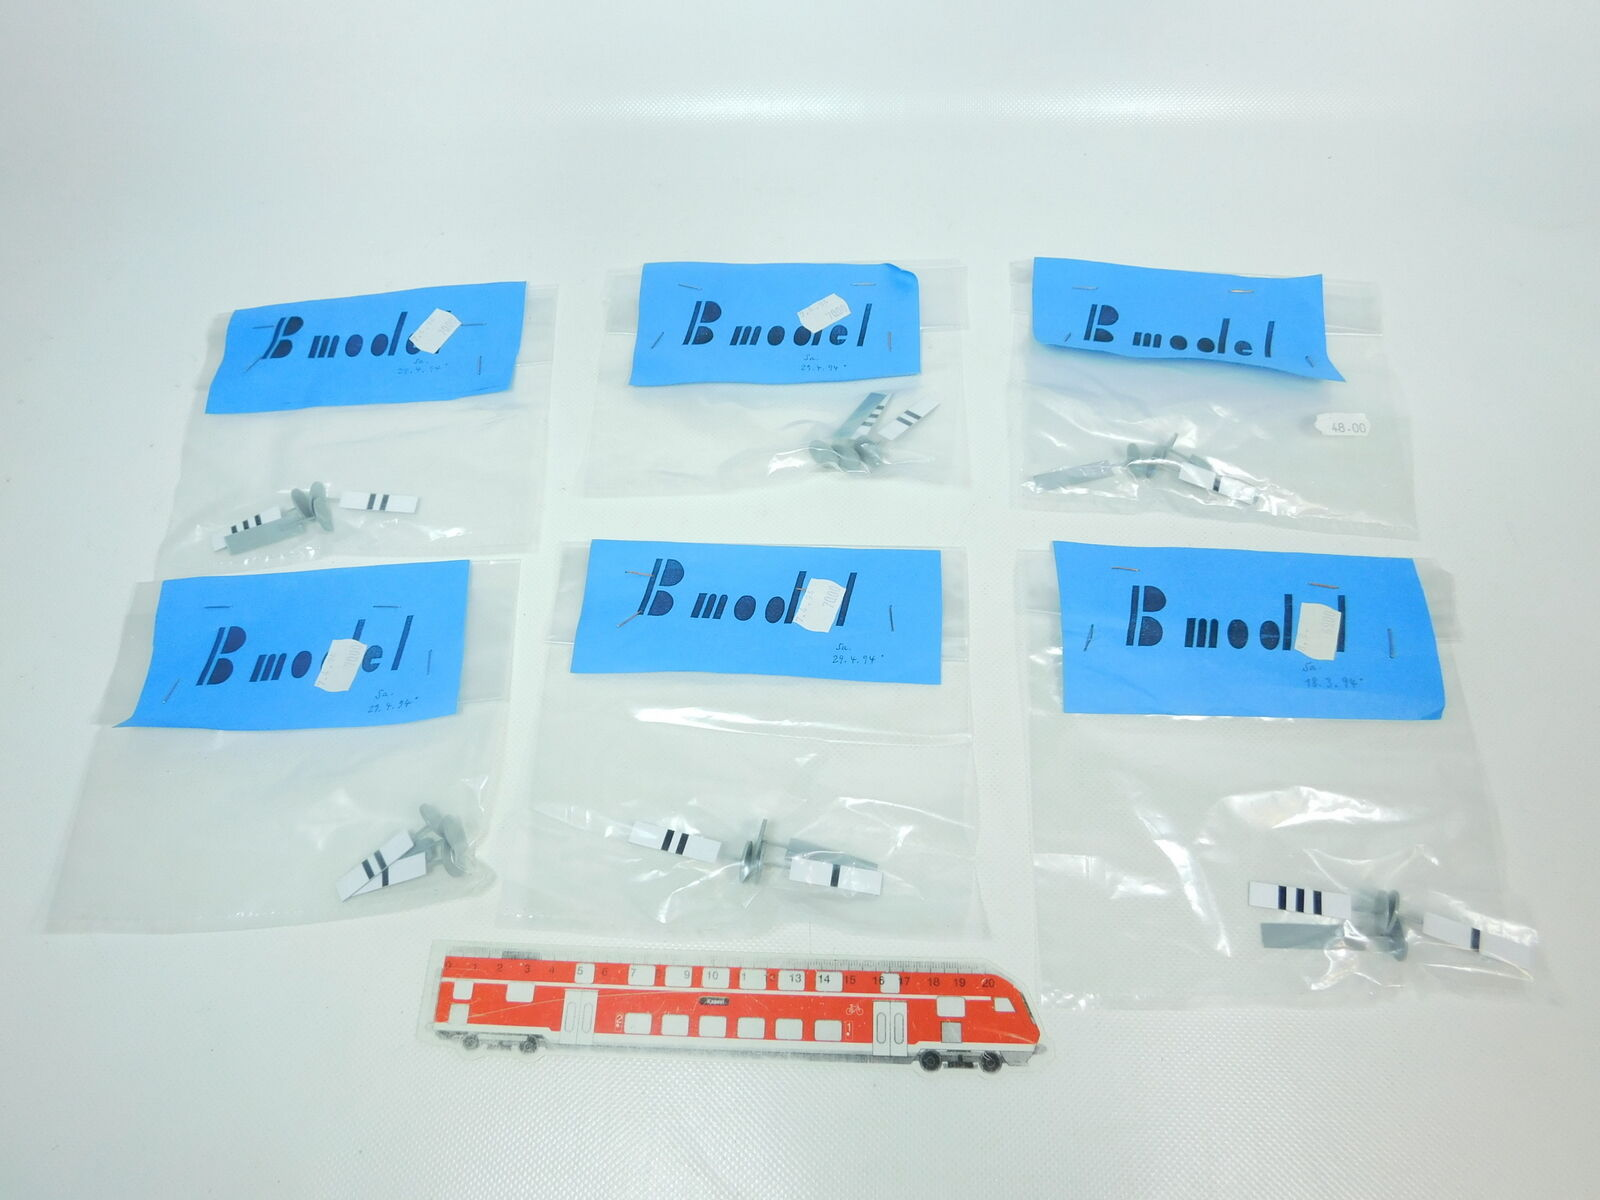 BR265-0,5  6x B Model   Ets   Traccia 0 Pacco Warnbake / Leitbake, Nuovo + Ovp